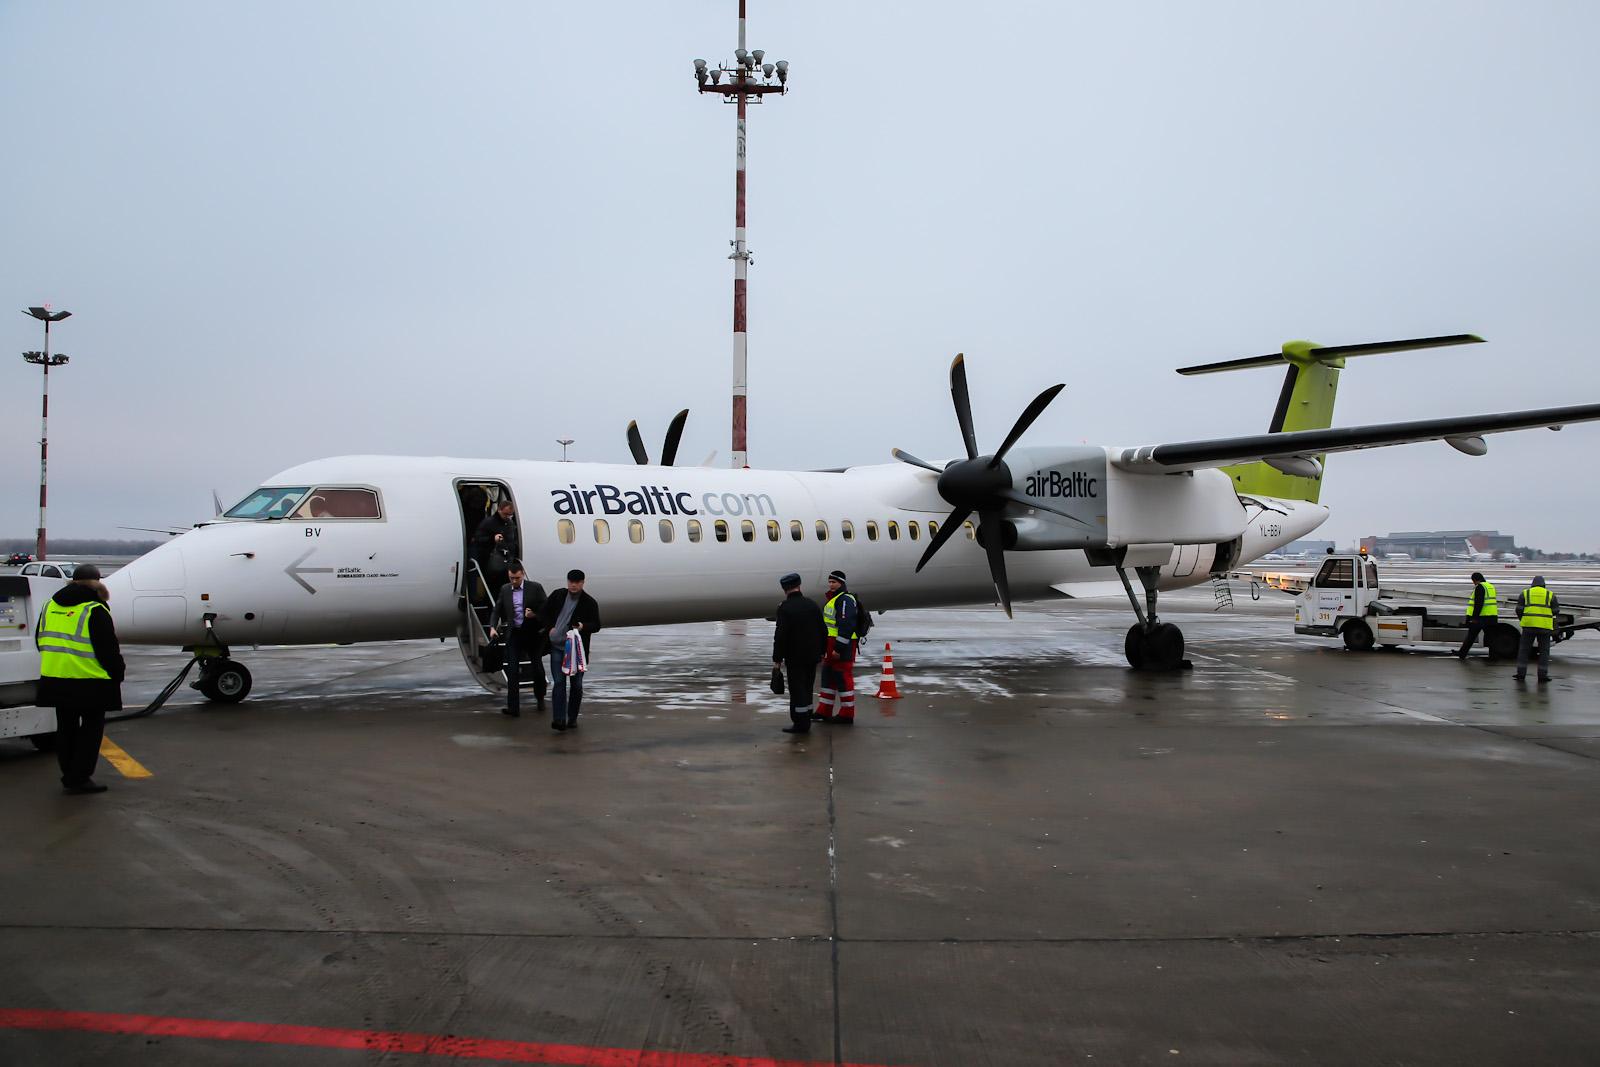 Bombardier Dash 8Q-400 авиакомпании airBaltic в аэропорту Внуково